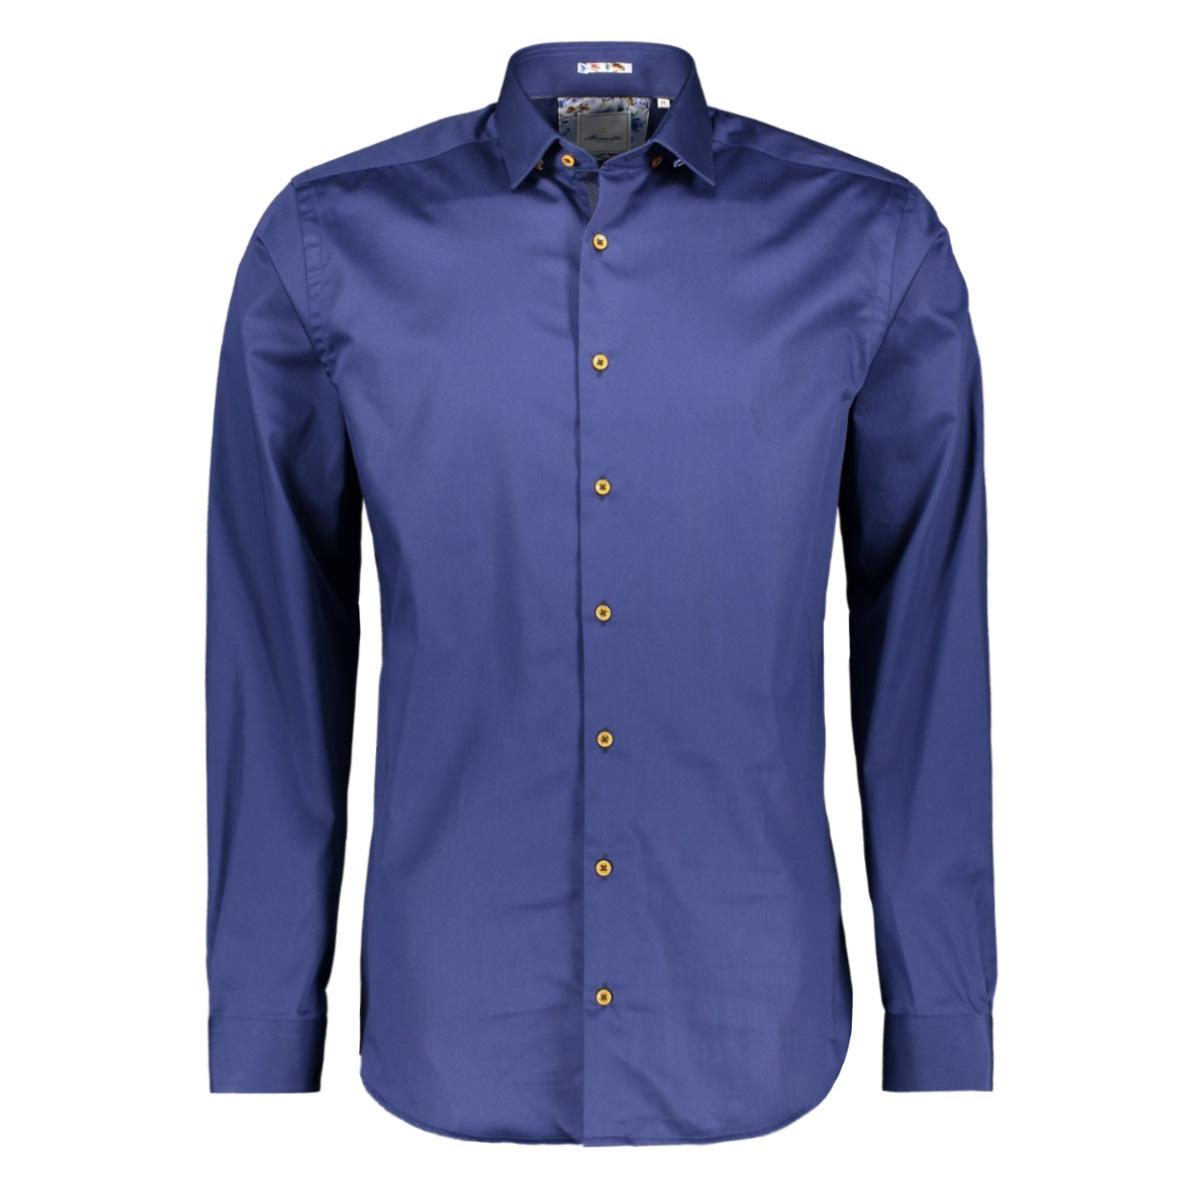 21 19sh200 5 marnelli overhemd 012